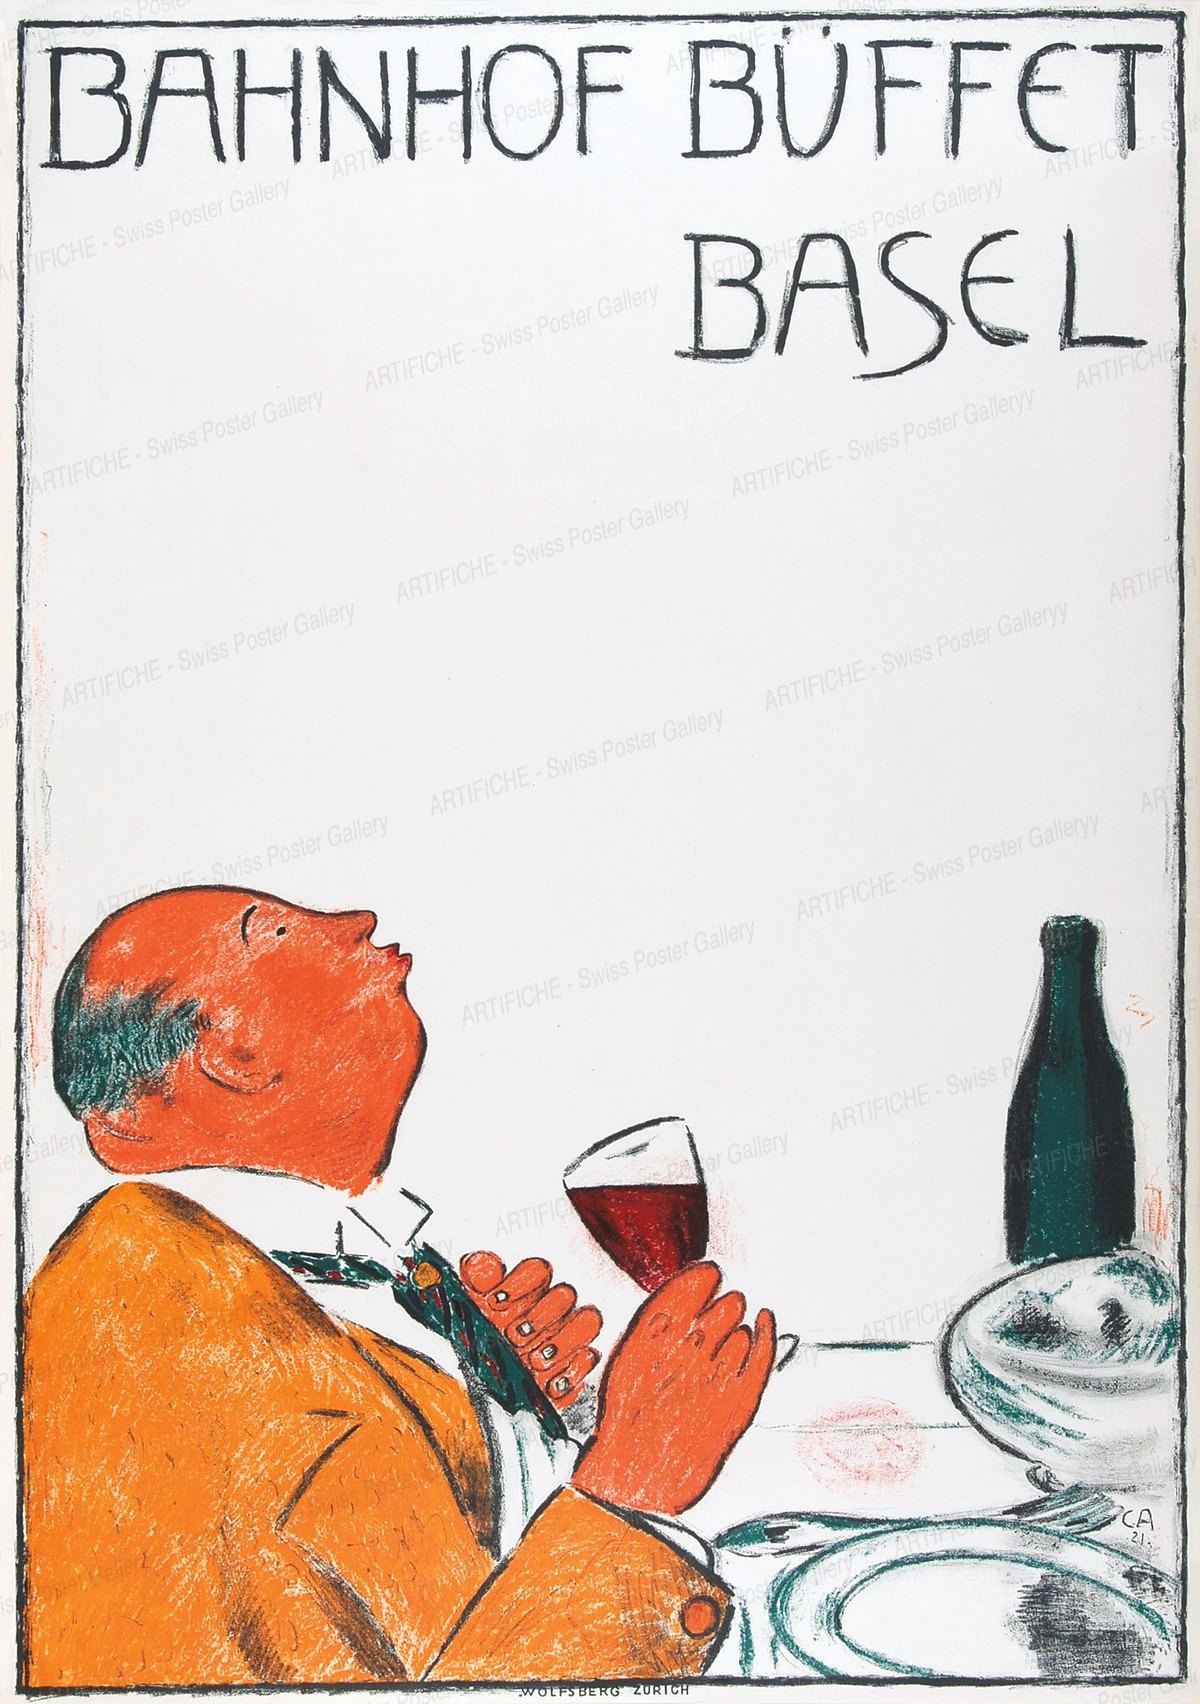 BAHNHOF BÜFFET BASEL, Cuno Amiet